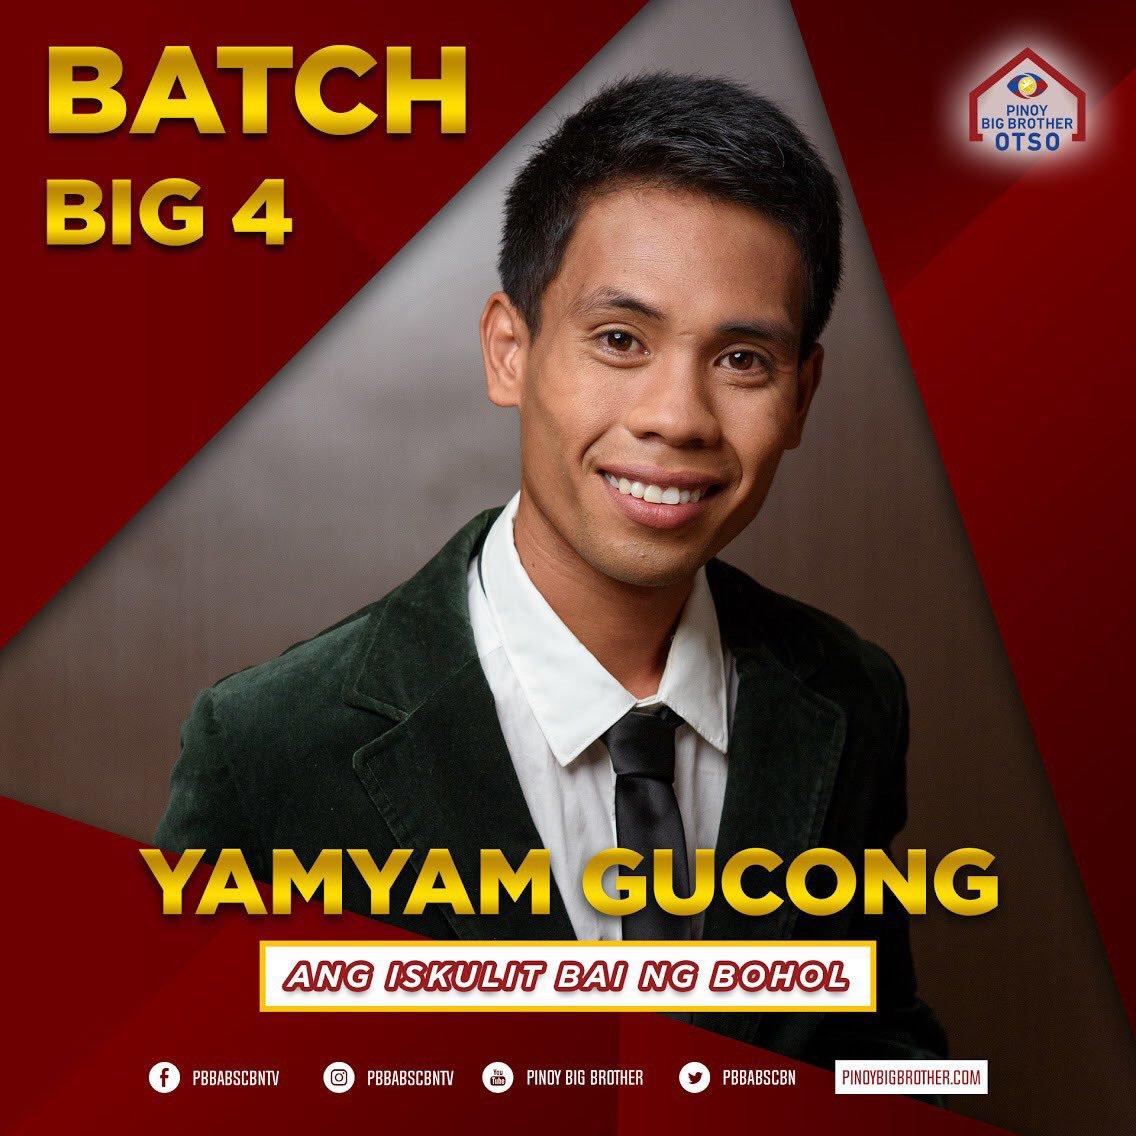 RT @PBBabscbn: Congratulations Yamyam! Ang unang BIG FOUR ng Batch 2 💪💥 #PBB8Batch2BigJump https://t.co/fjiJautNdj